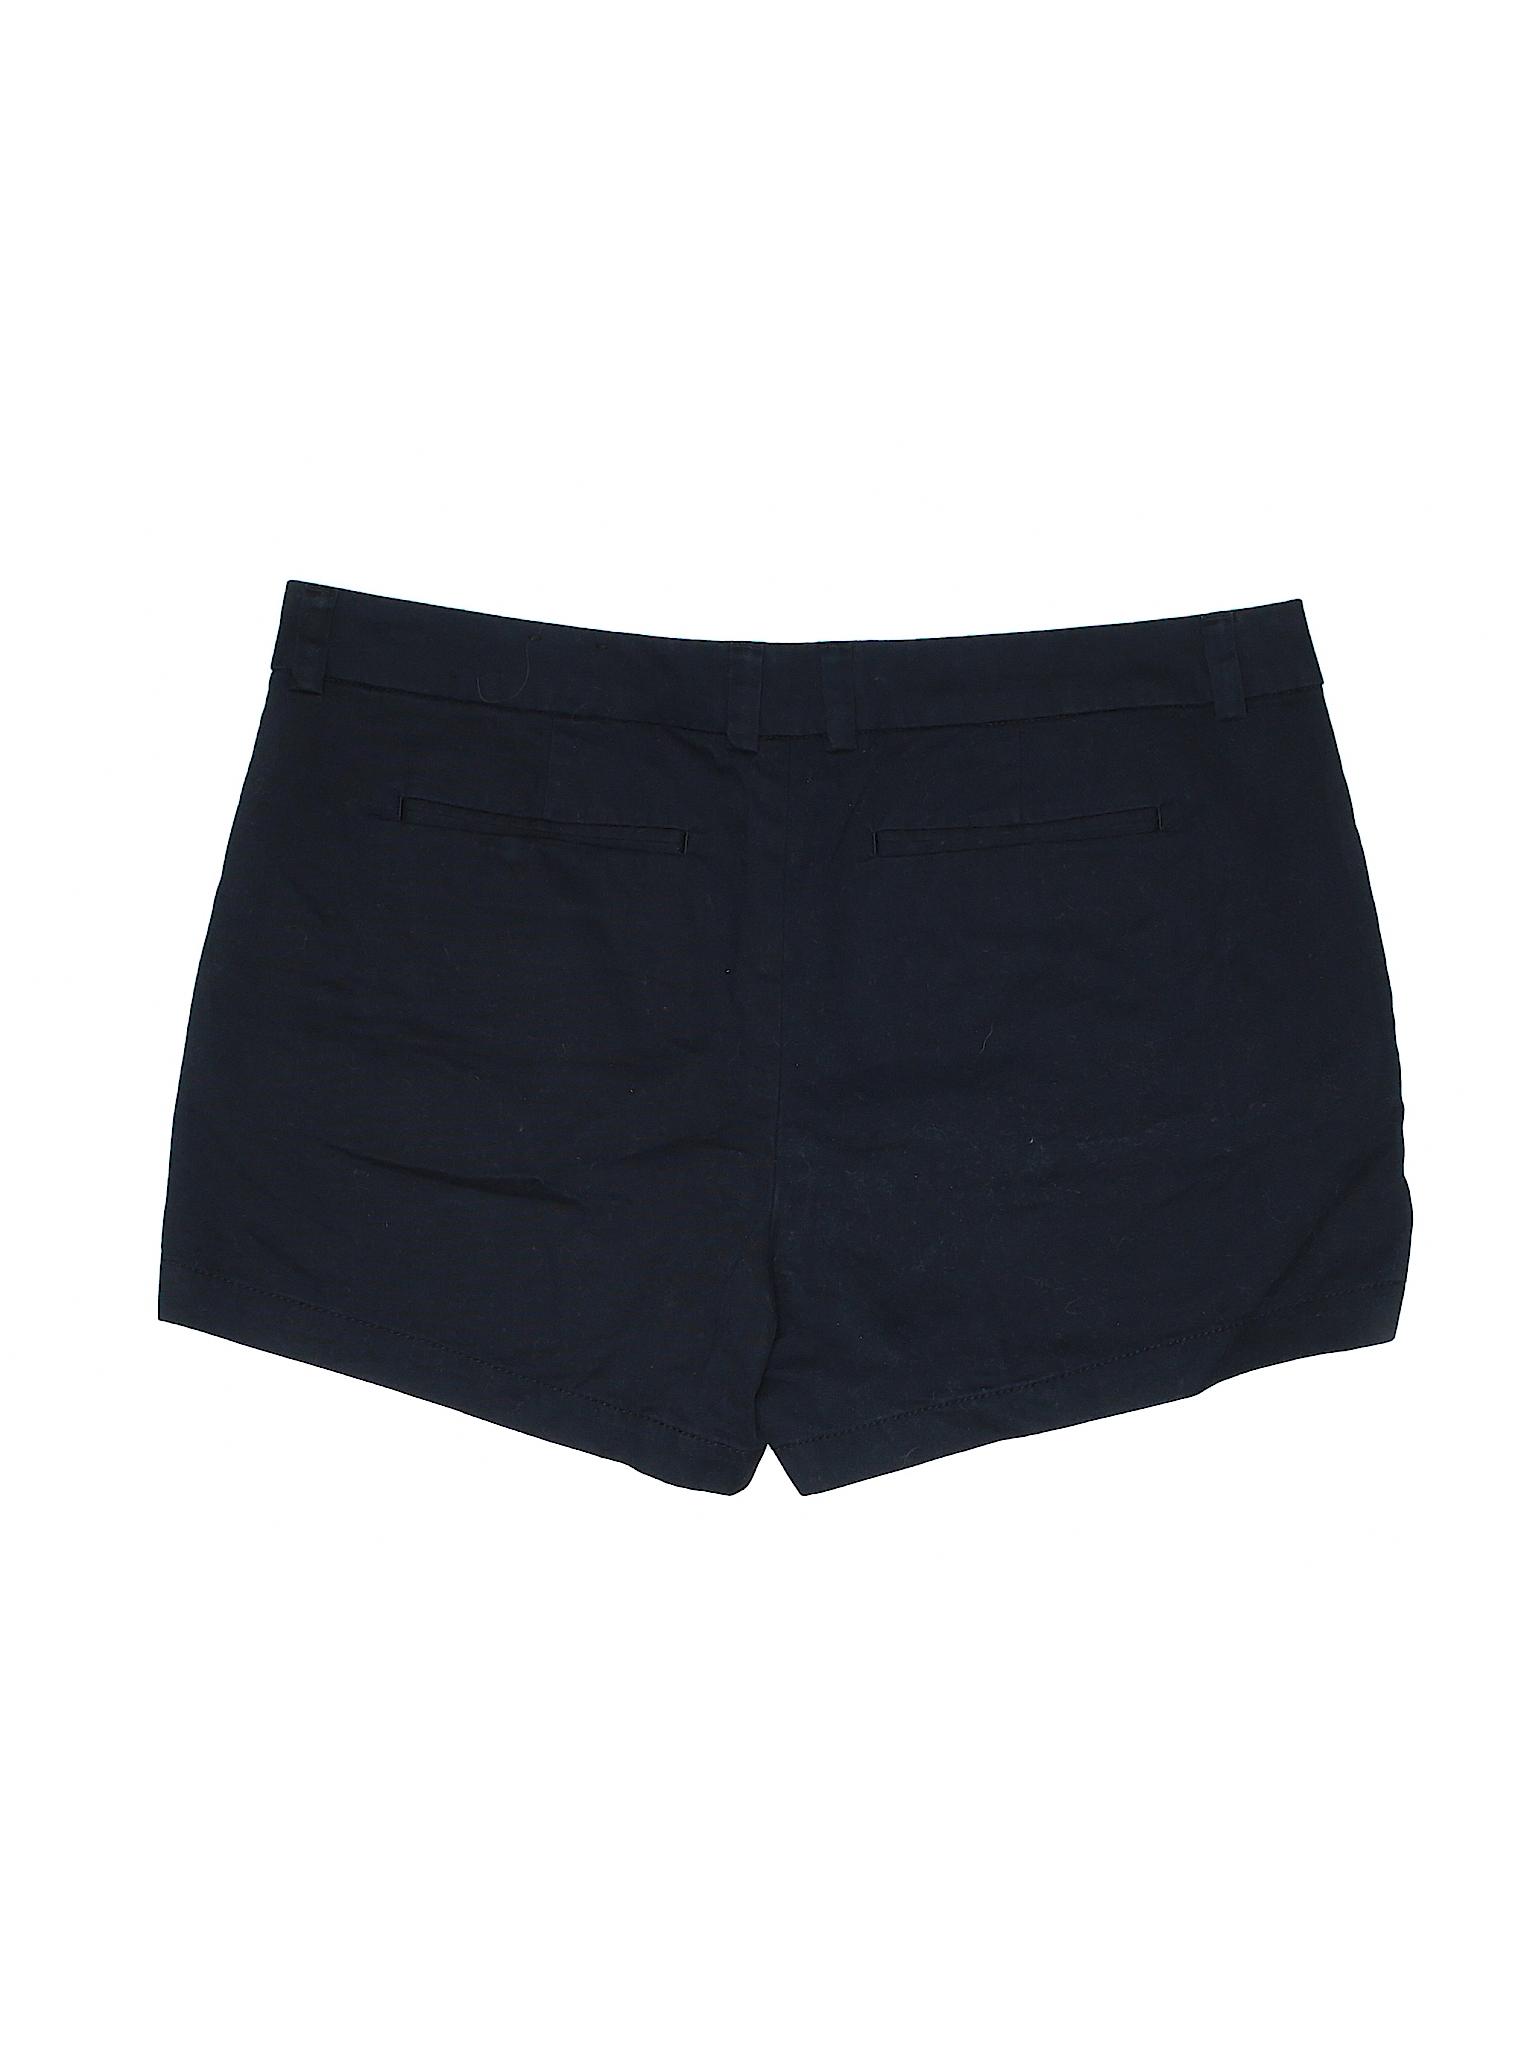 Shorts Stylus Khaki Boutique Stylus Boutique Stylus Khaki Boutique Shorts Khaki gwZzqOUw1